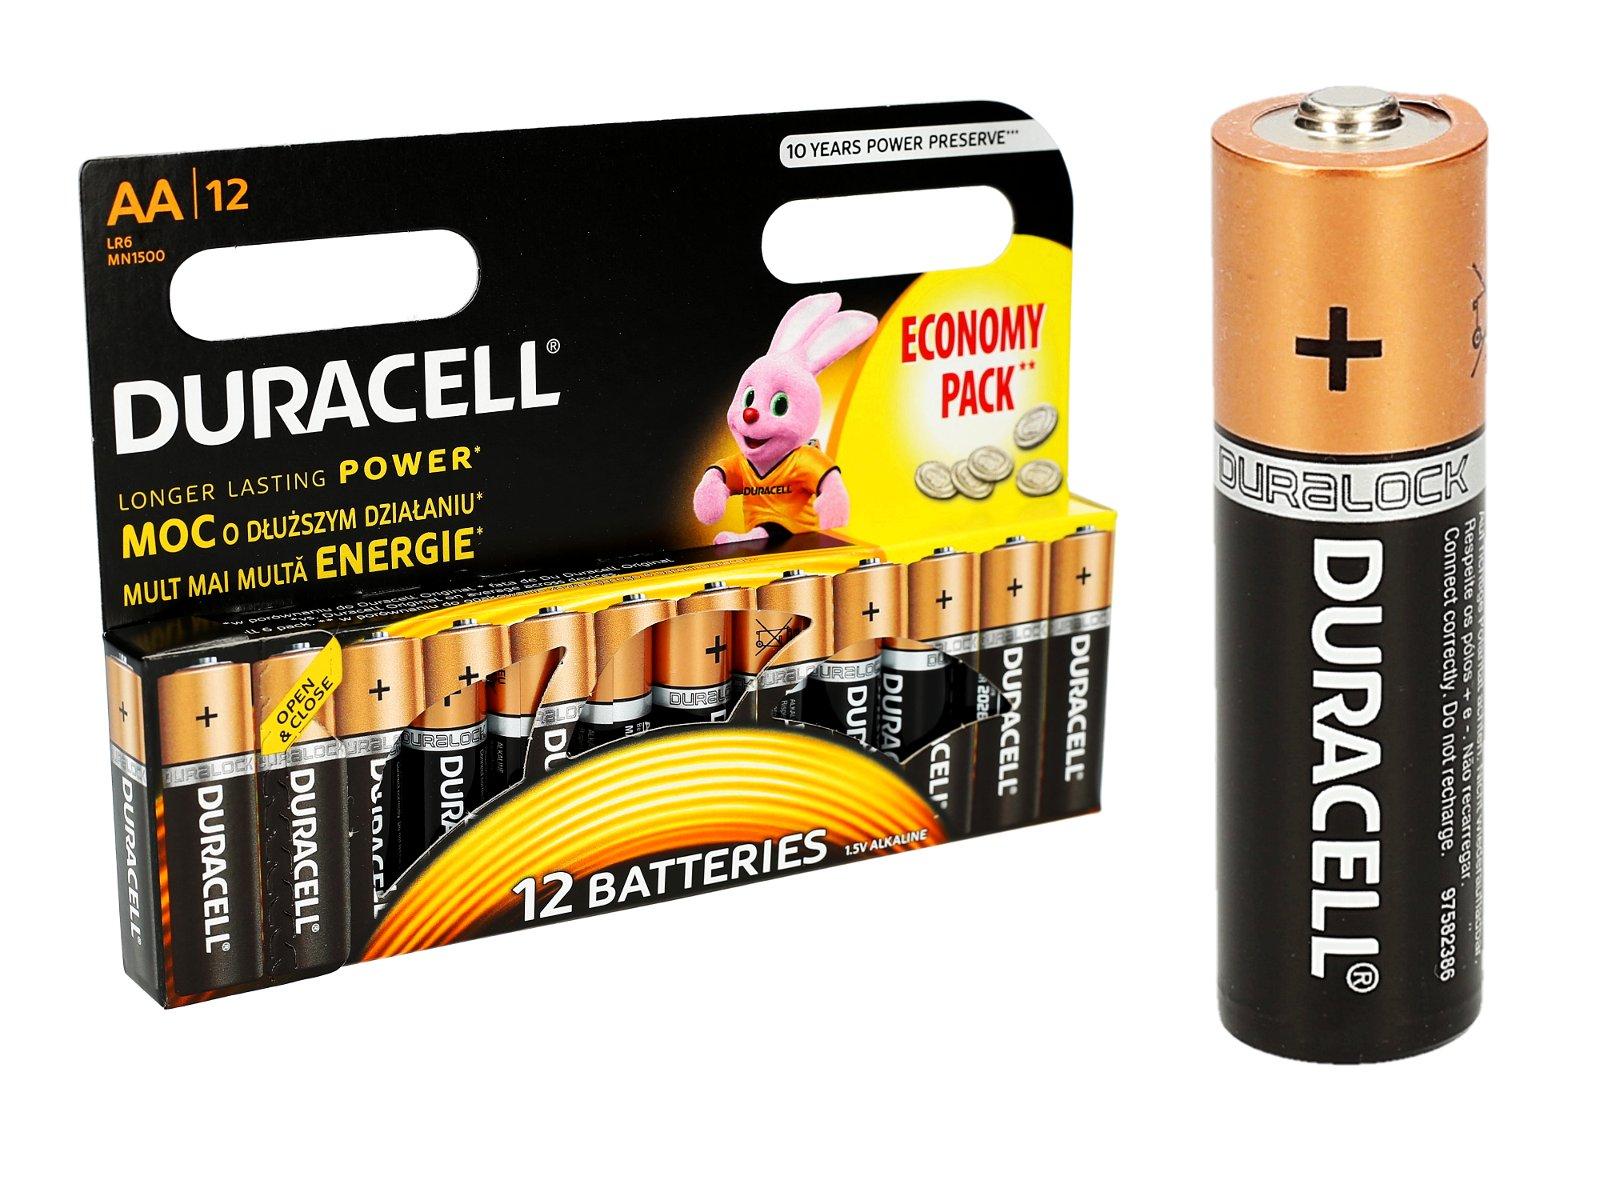 Oryginalne Baterie DURACELL AALR6 12 sztuk